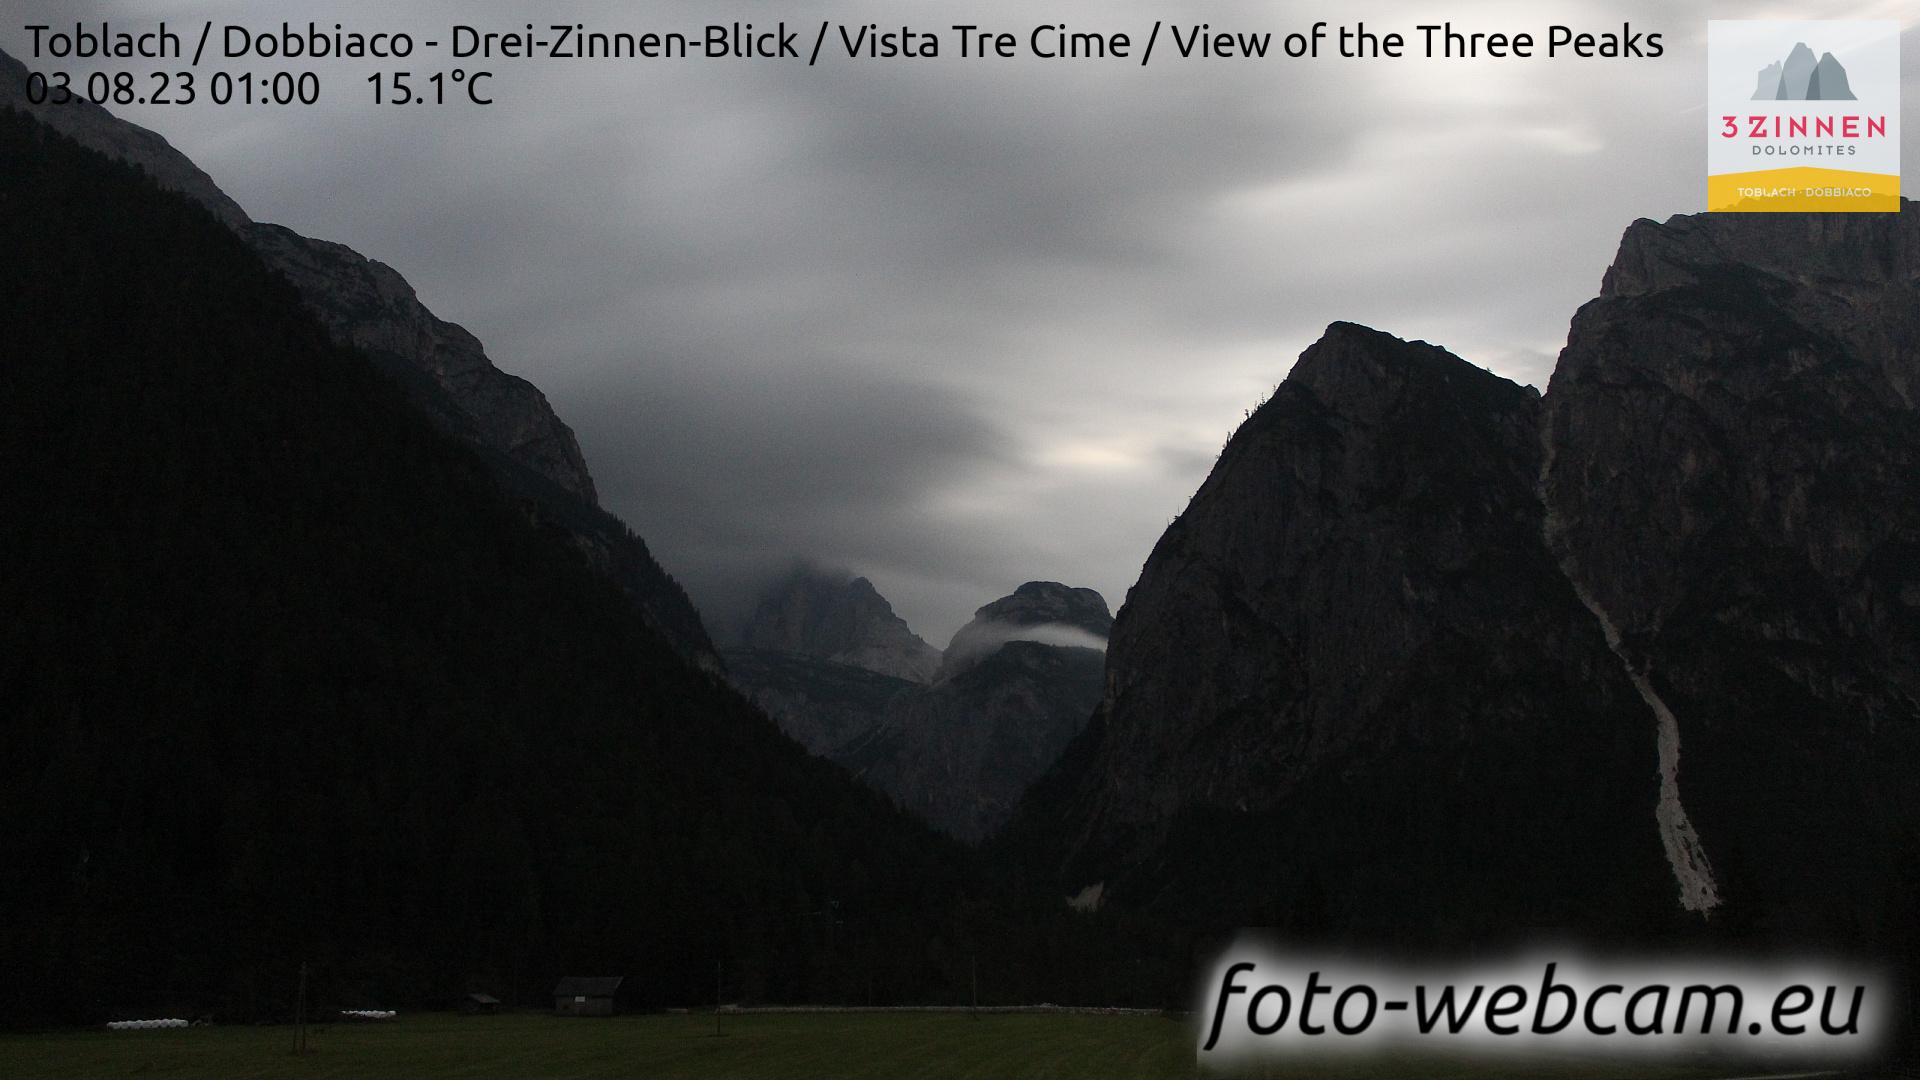 Toblach (Dolomiten) Do. 01:27